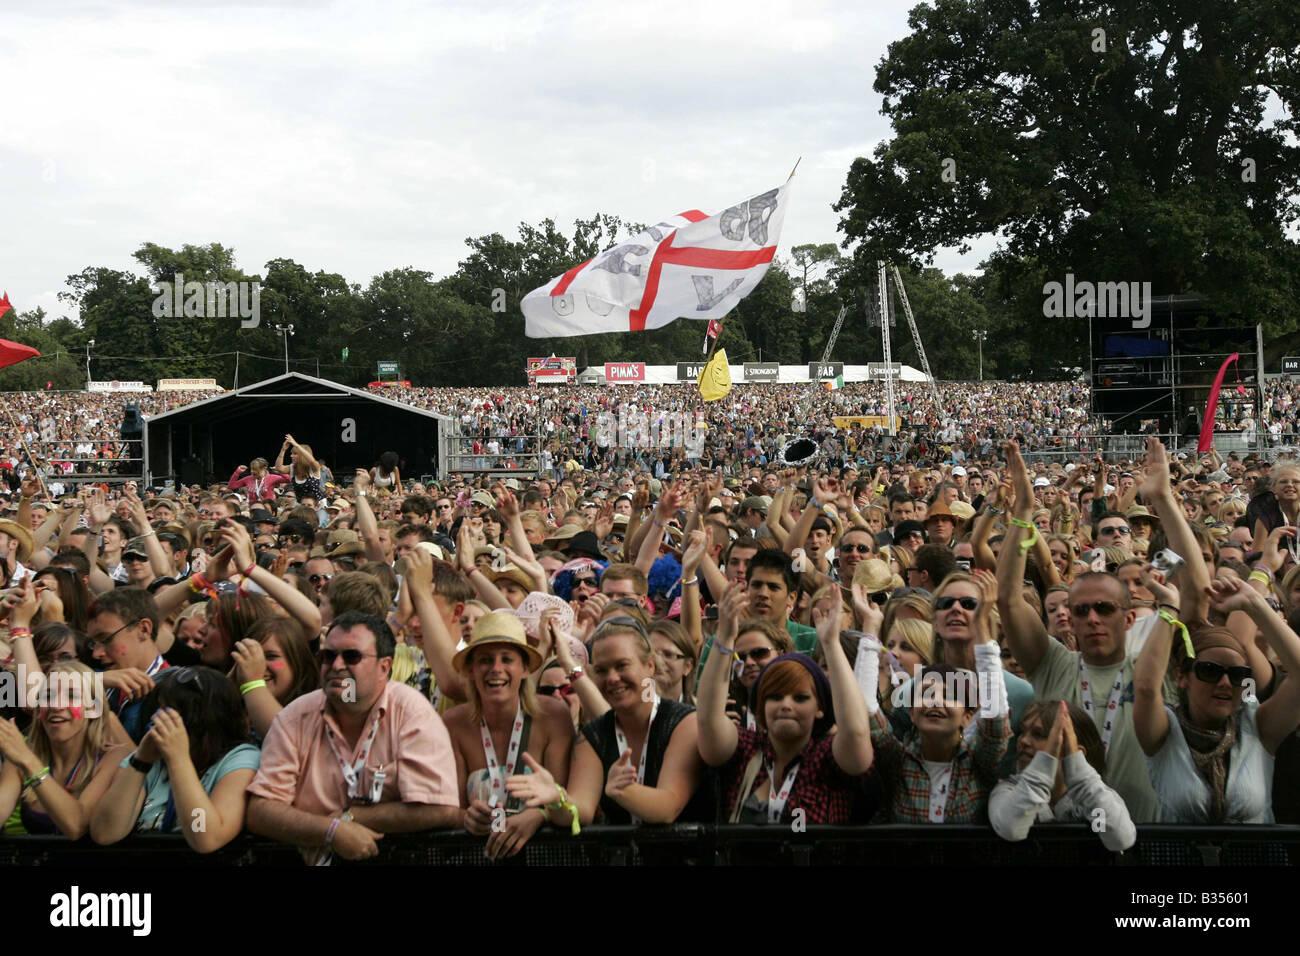 CROWD FANS AT V FESTIVAL MUSIC FESTIVAL CHELMSFORD - Stock Image